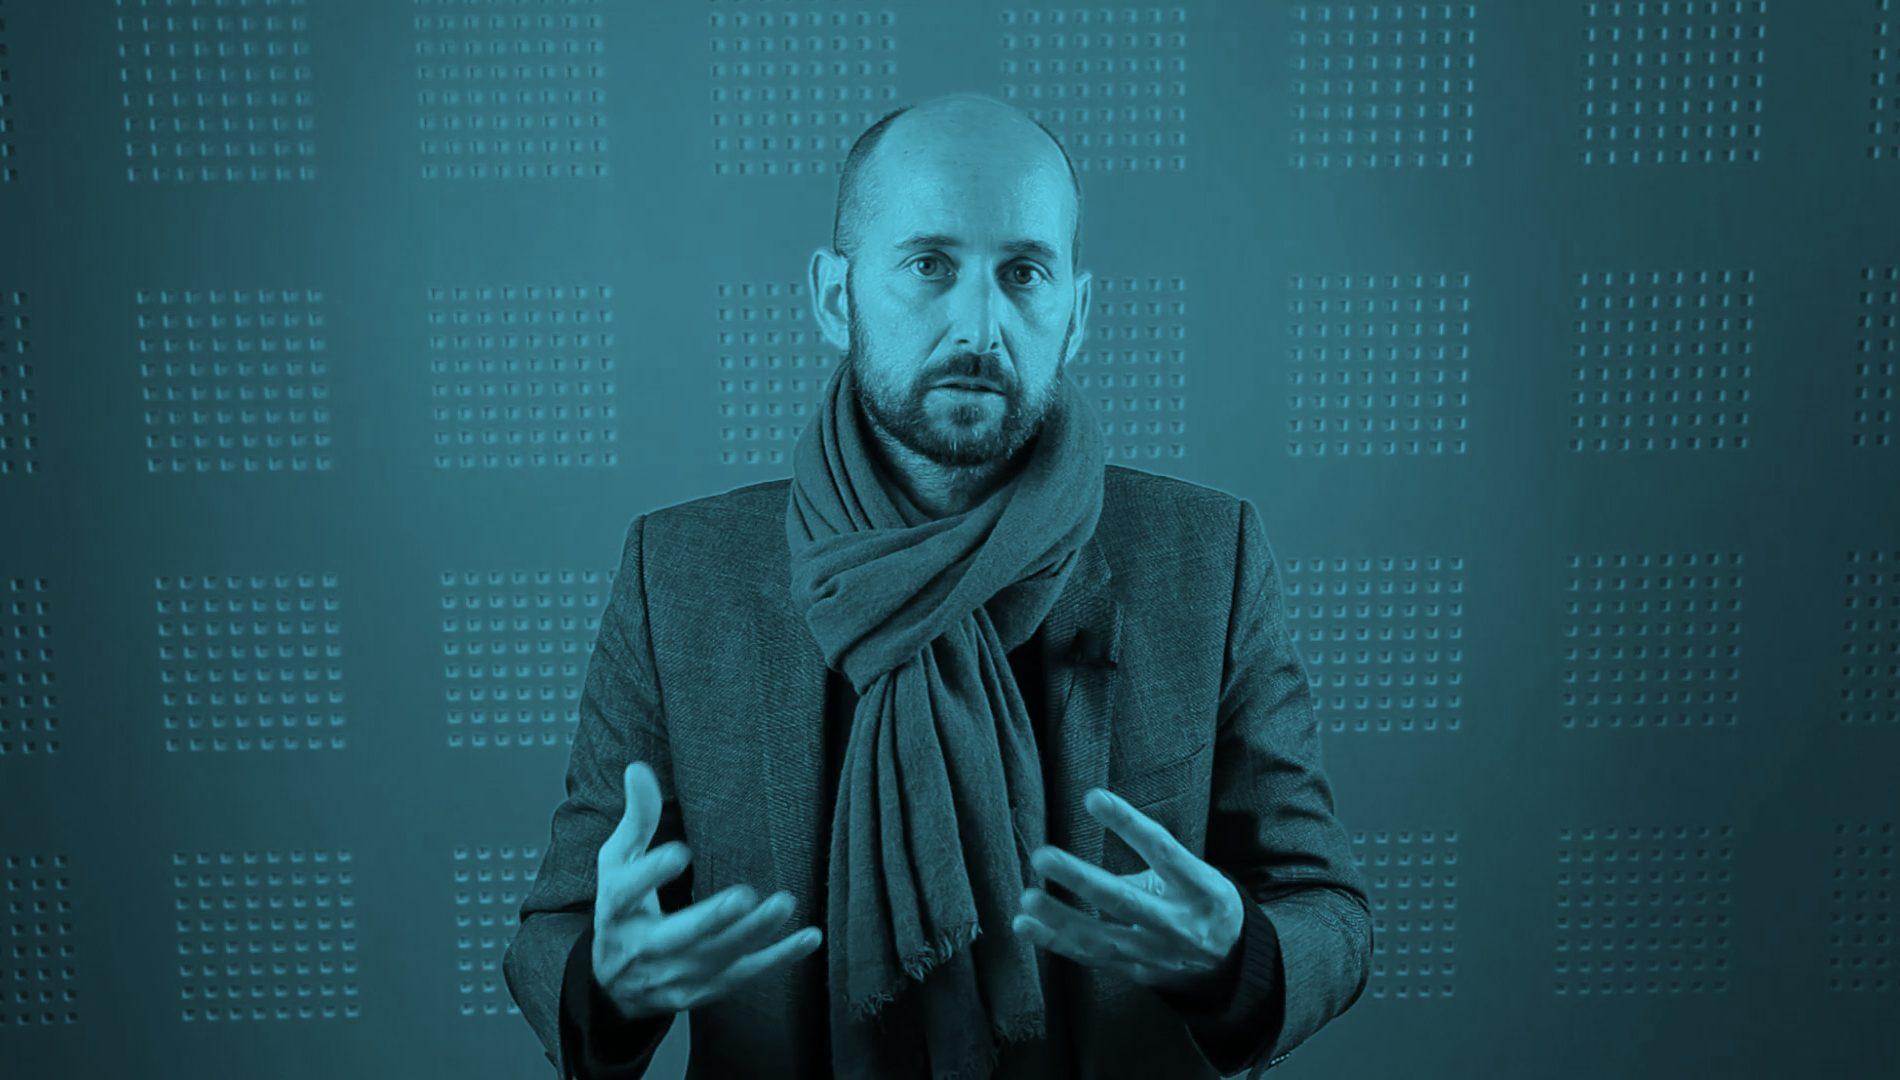 Antoine Fenoglio, designer et président de l'agence Les Sismo